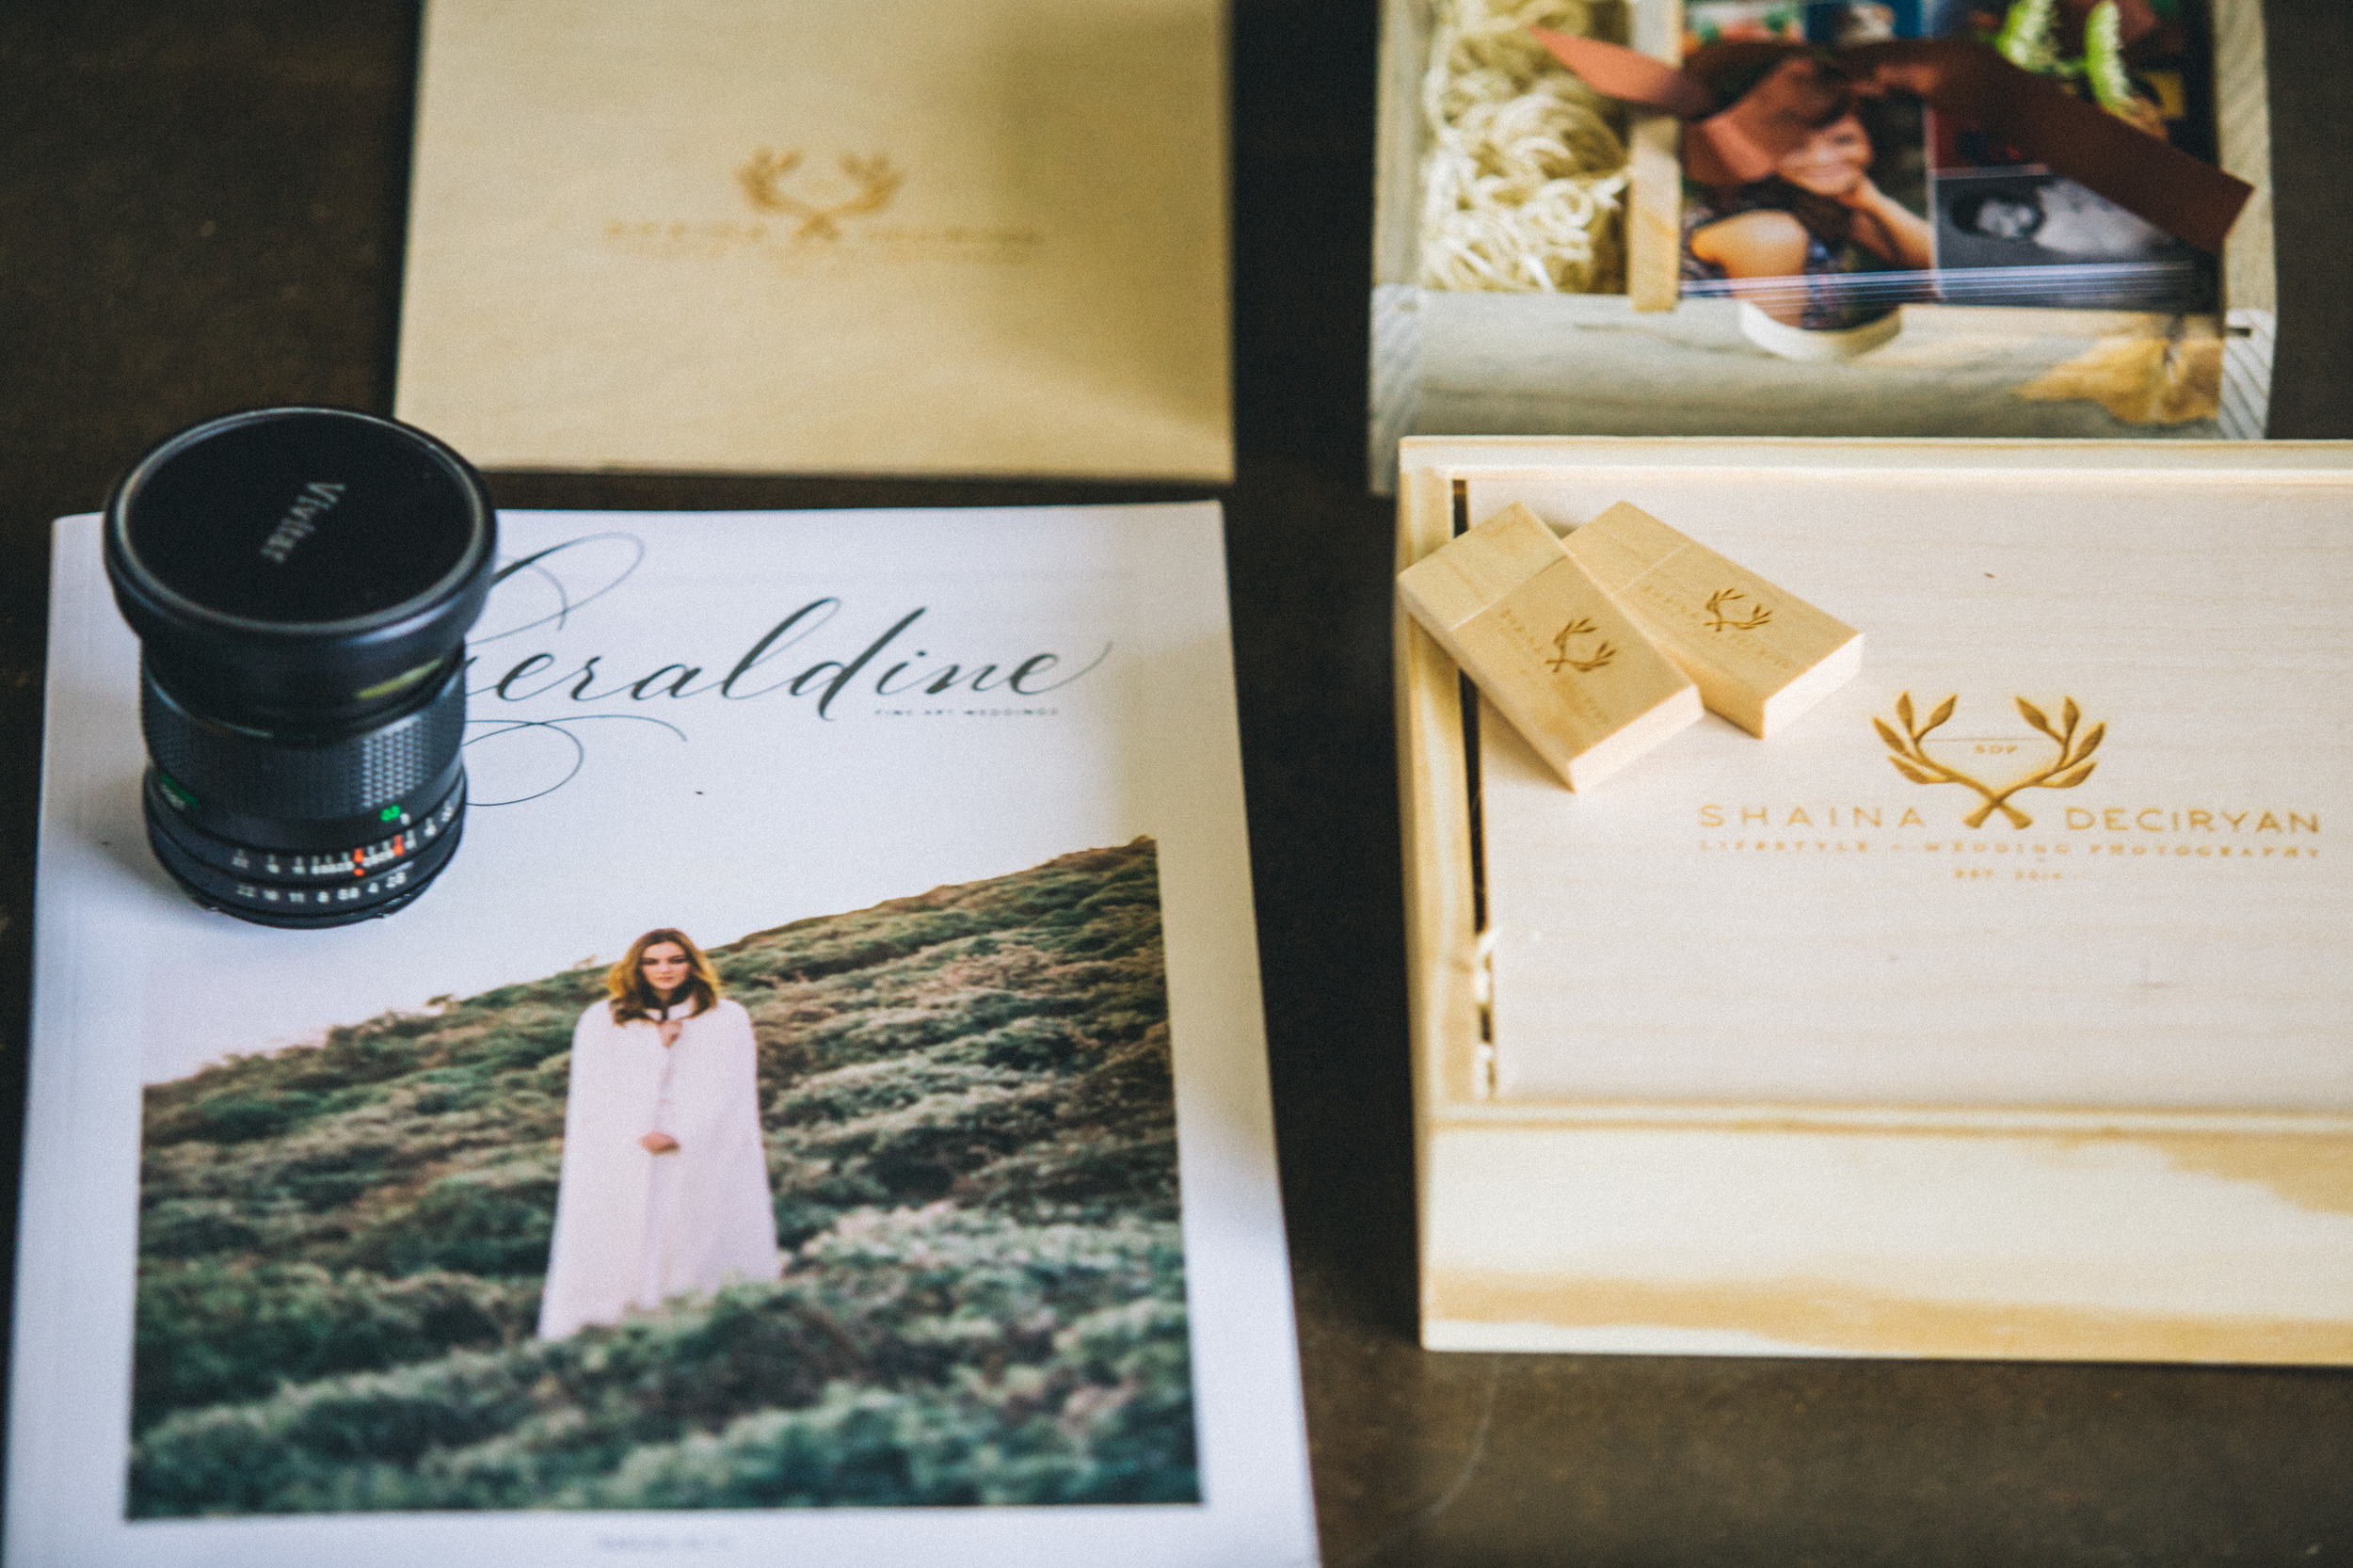 Orlando Wedding photographer fine art prints gifts wooden usb gift box- ShainaDeCiryan.com 14.jpg